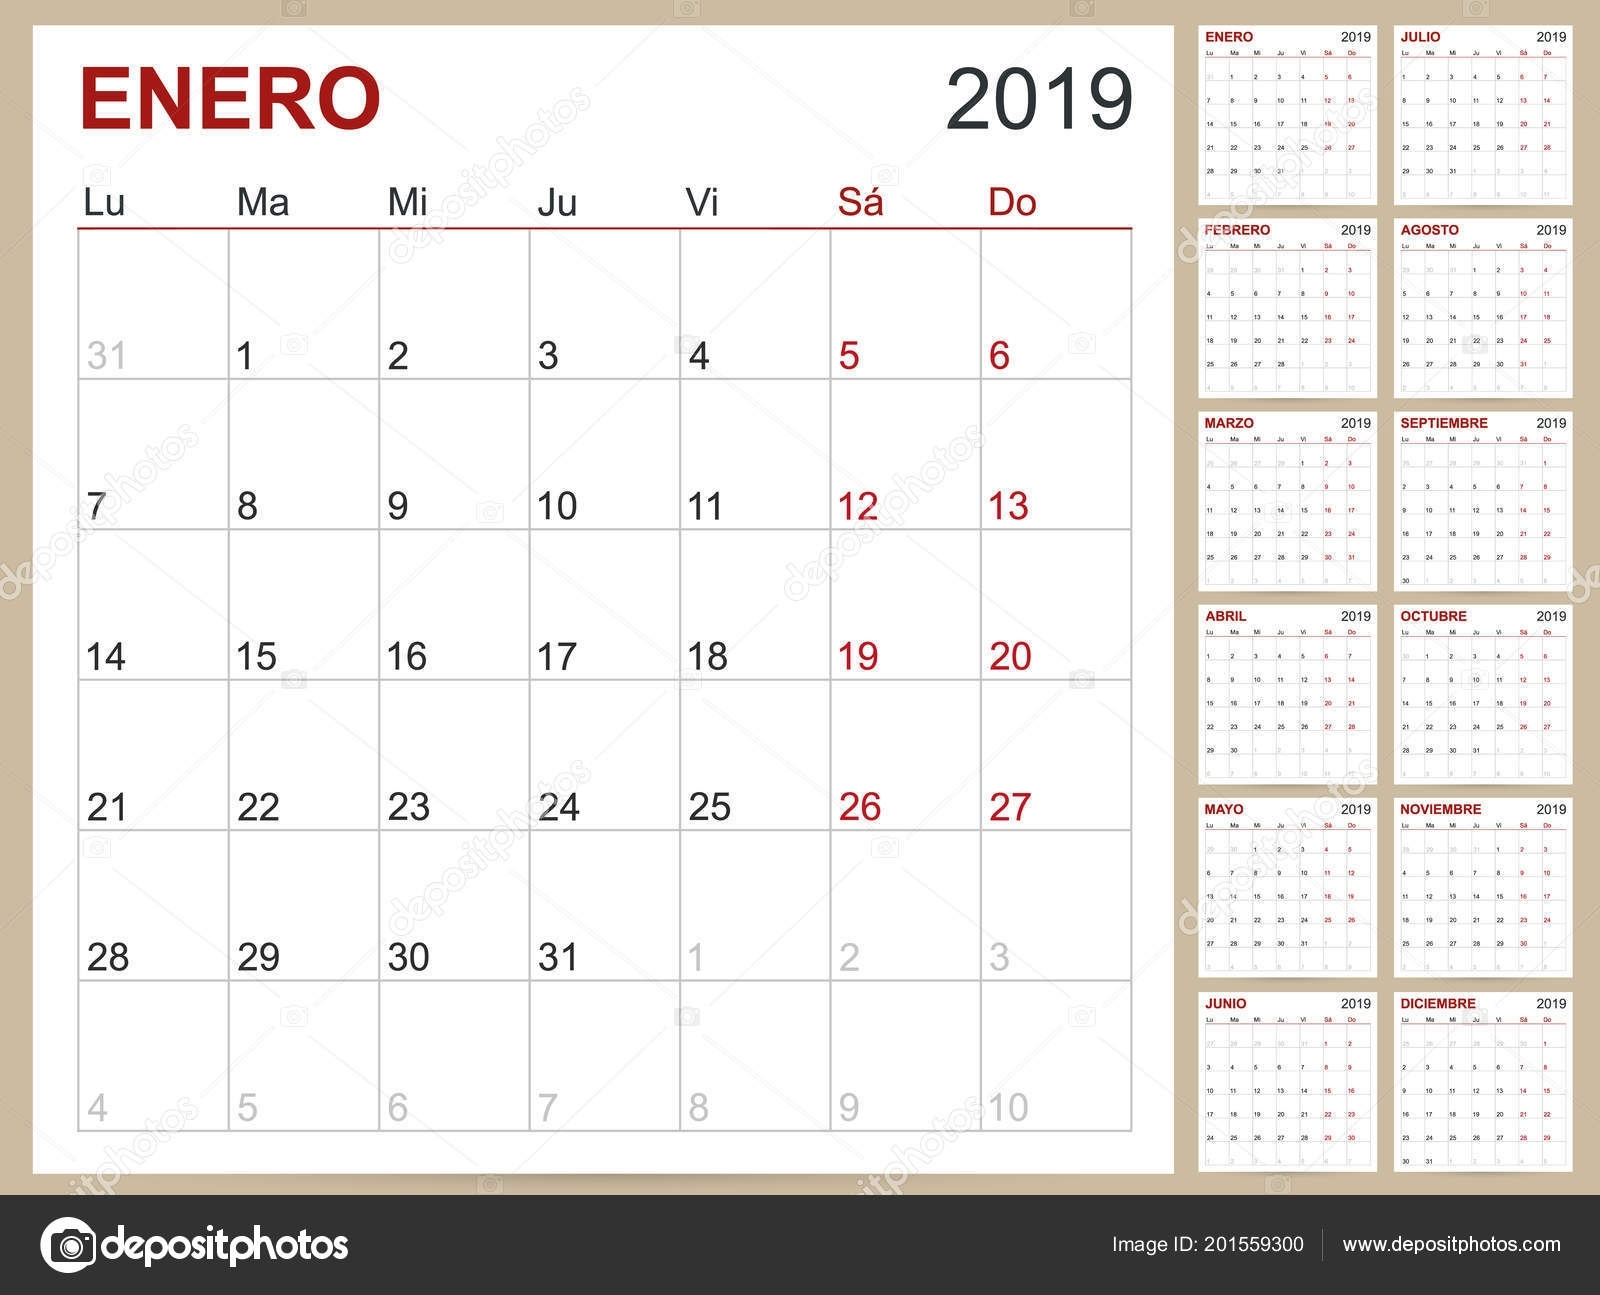 Spanish Calendar Template | Spanish Planning Calendar 2019